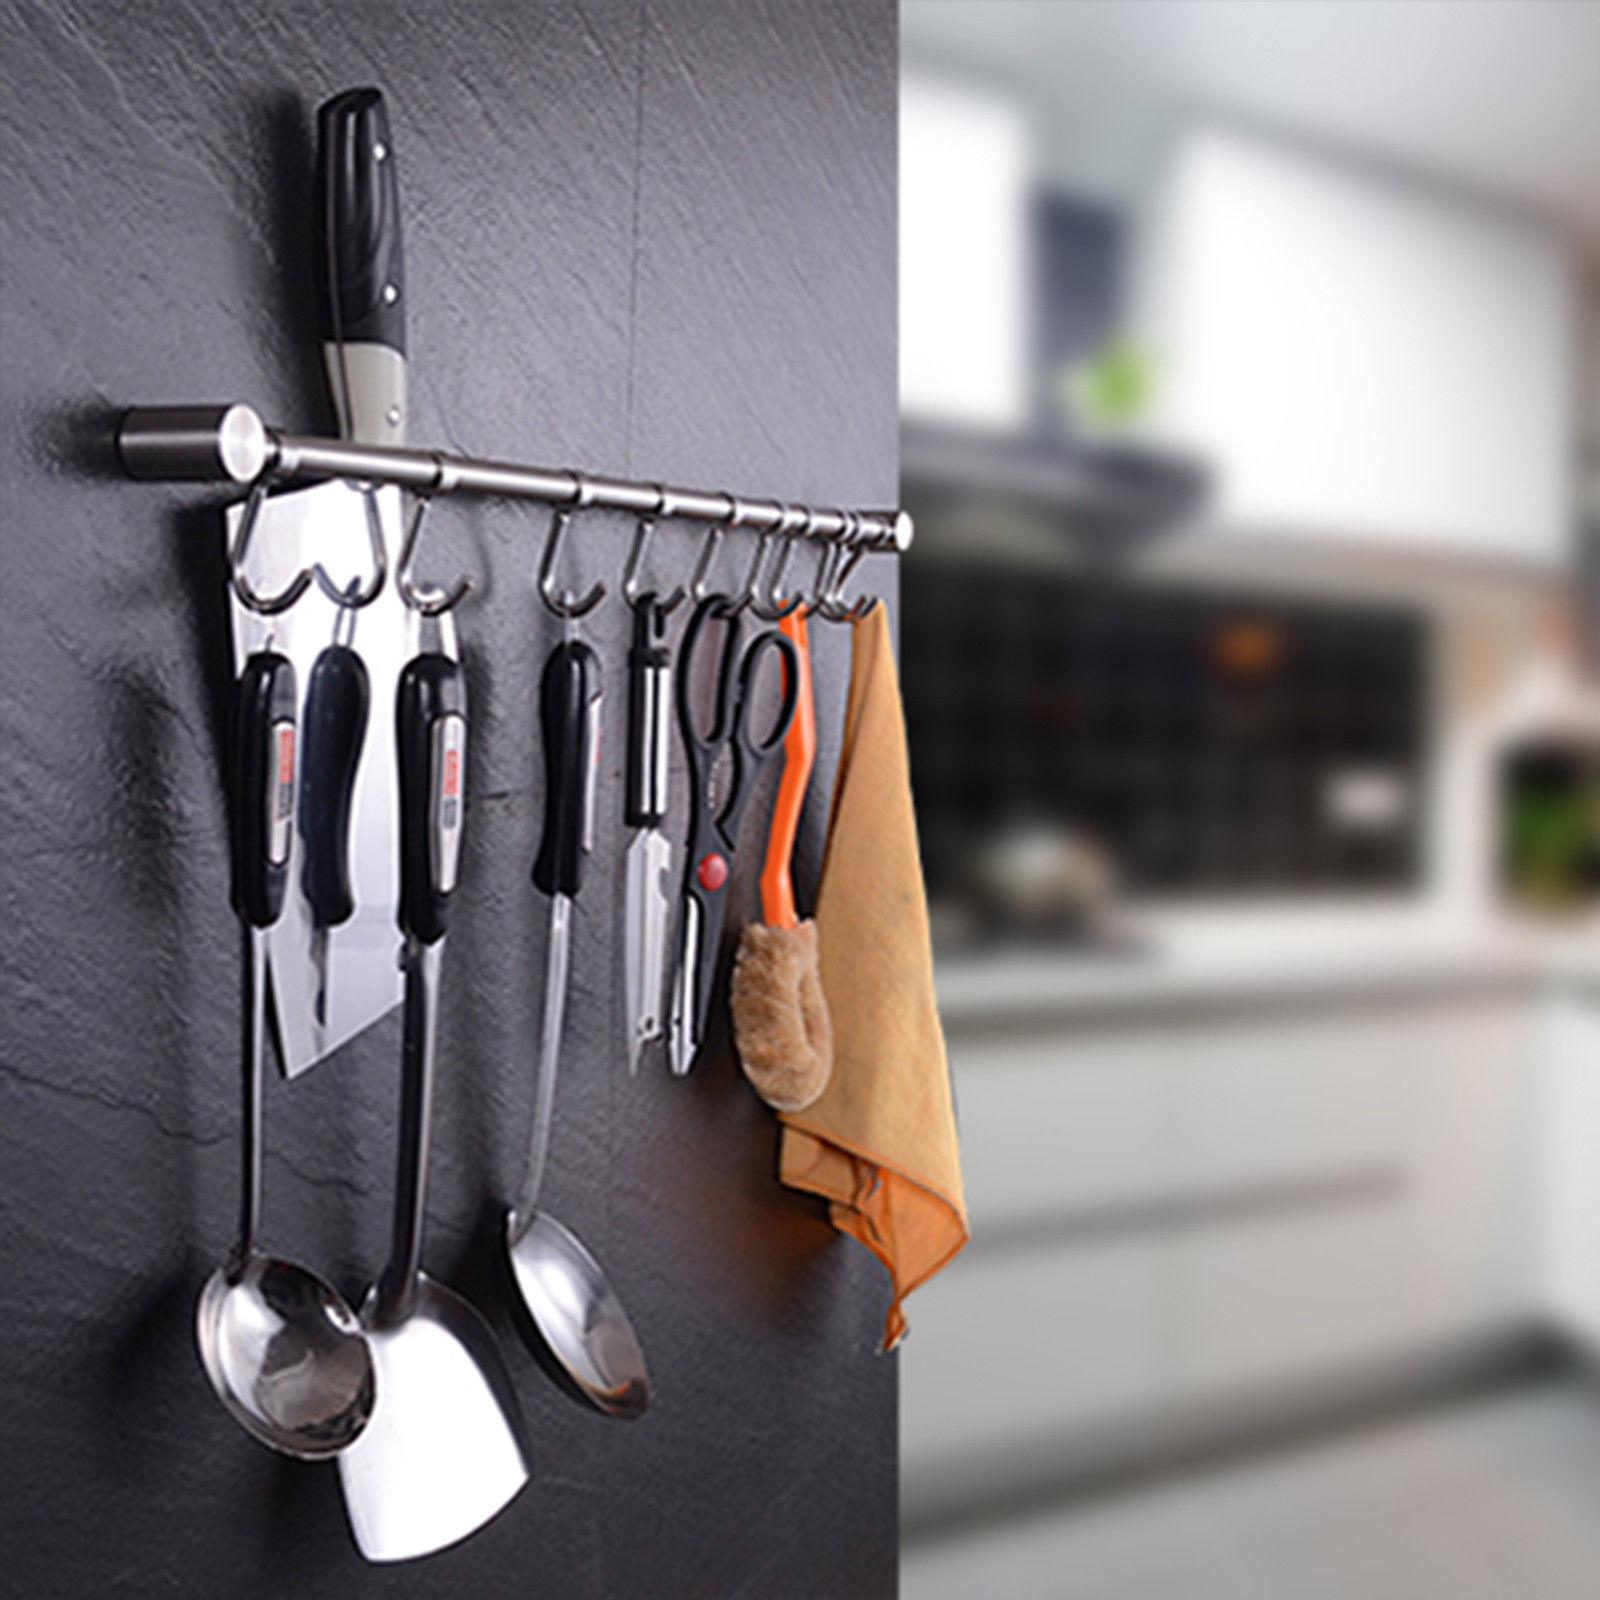 storage holder Kitchen Wall Mounted Chrome Hanging Rail Utensils Rack Storage Holder w/ Hooks